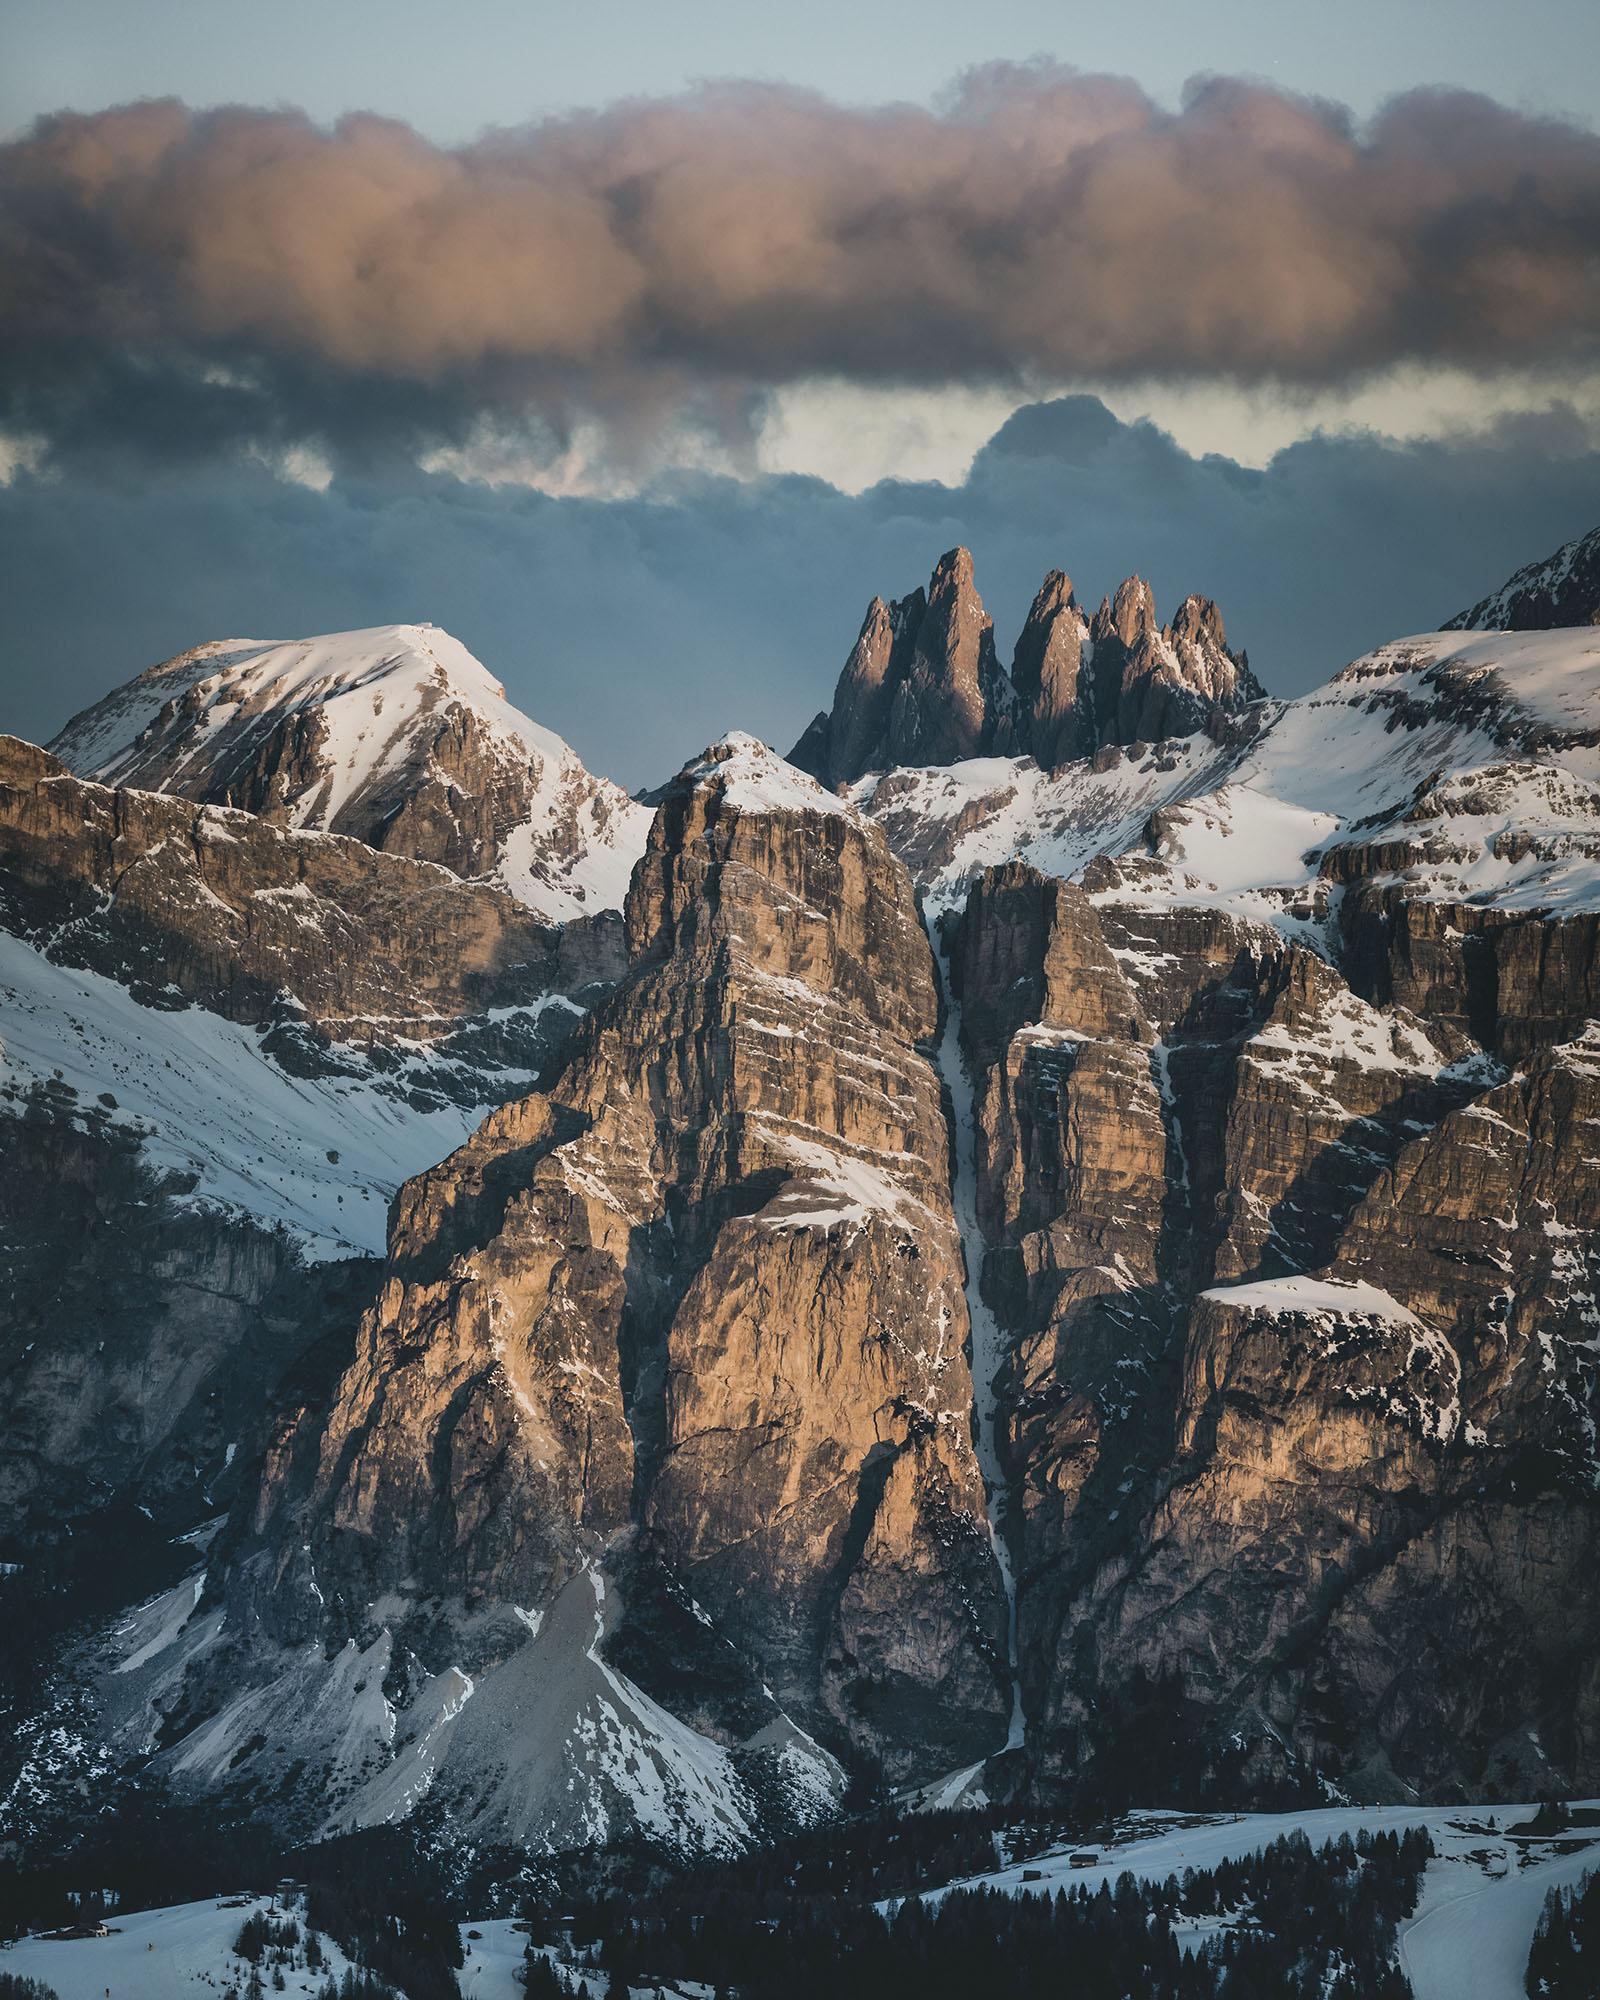 Rifugio Lagazuoi, Dolomites